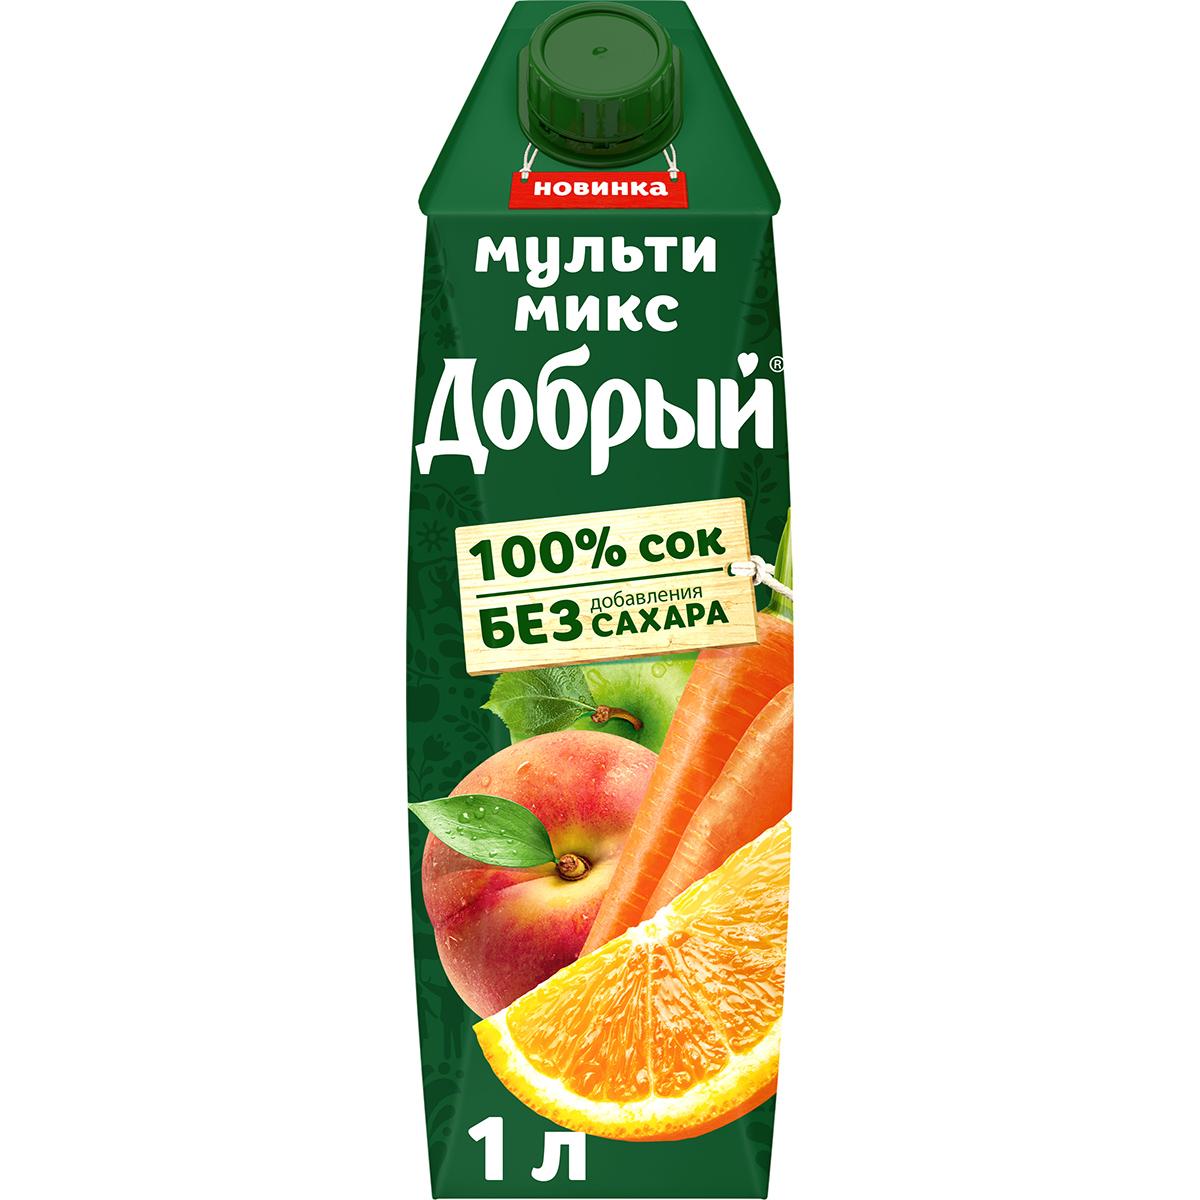 Сок Добрый Мульти Микс 1 л